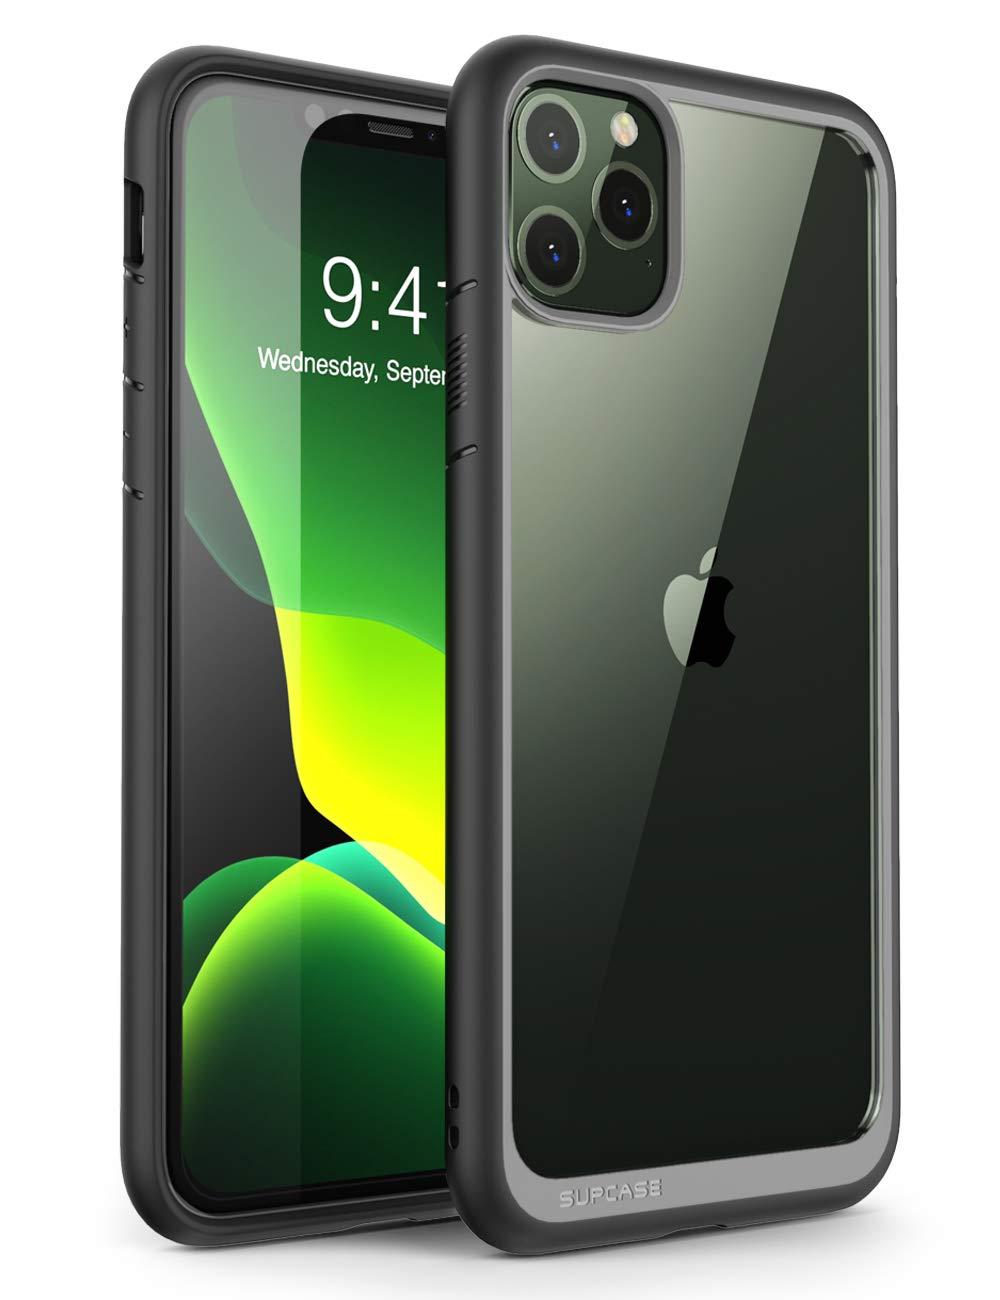 Funda Para iPhone 11 Pro Max (6.5) Supcase [7w5pv7l9]